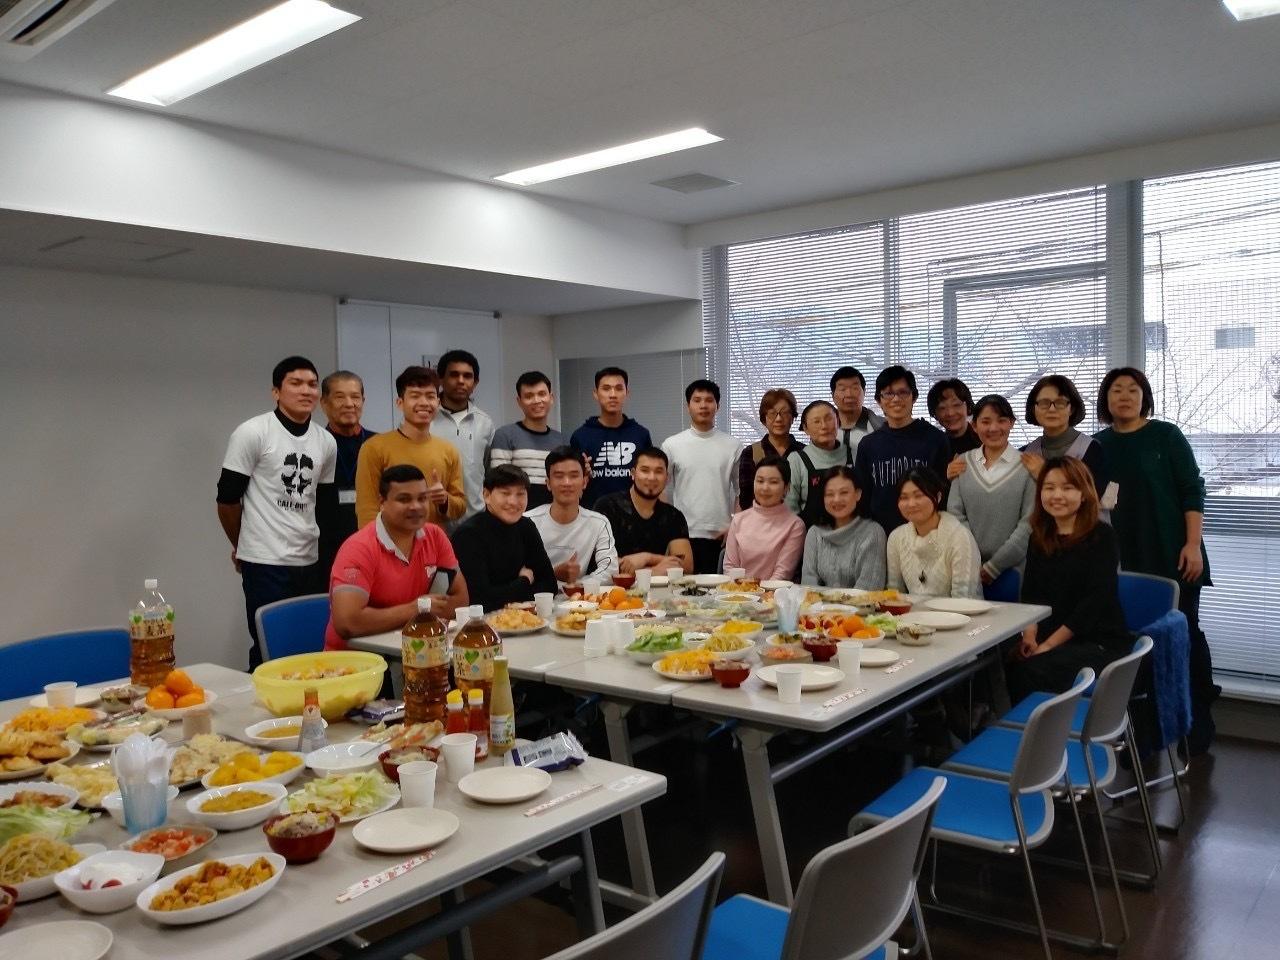 私の国の料理ー火曜夜教室_e0175020_15555995.jpg